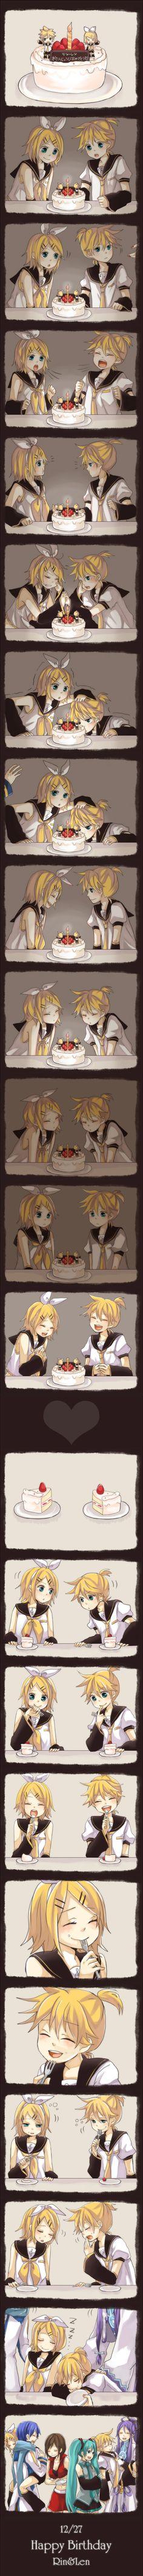 Vocaloid - rin and len